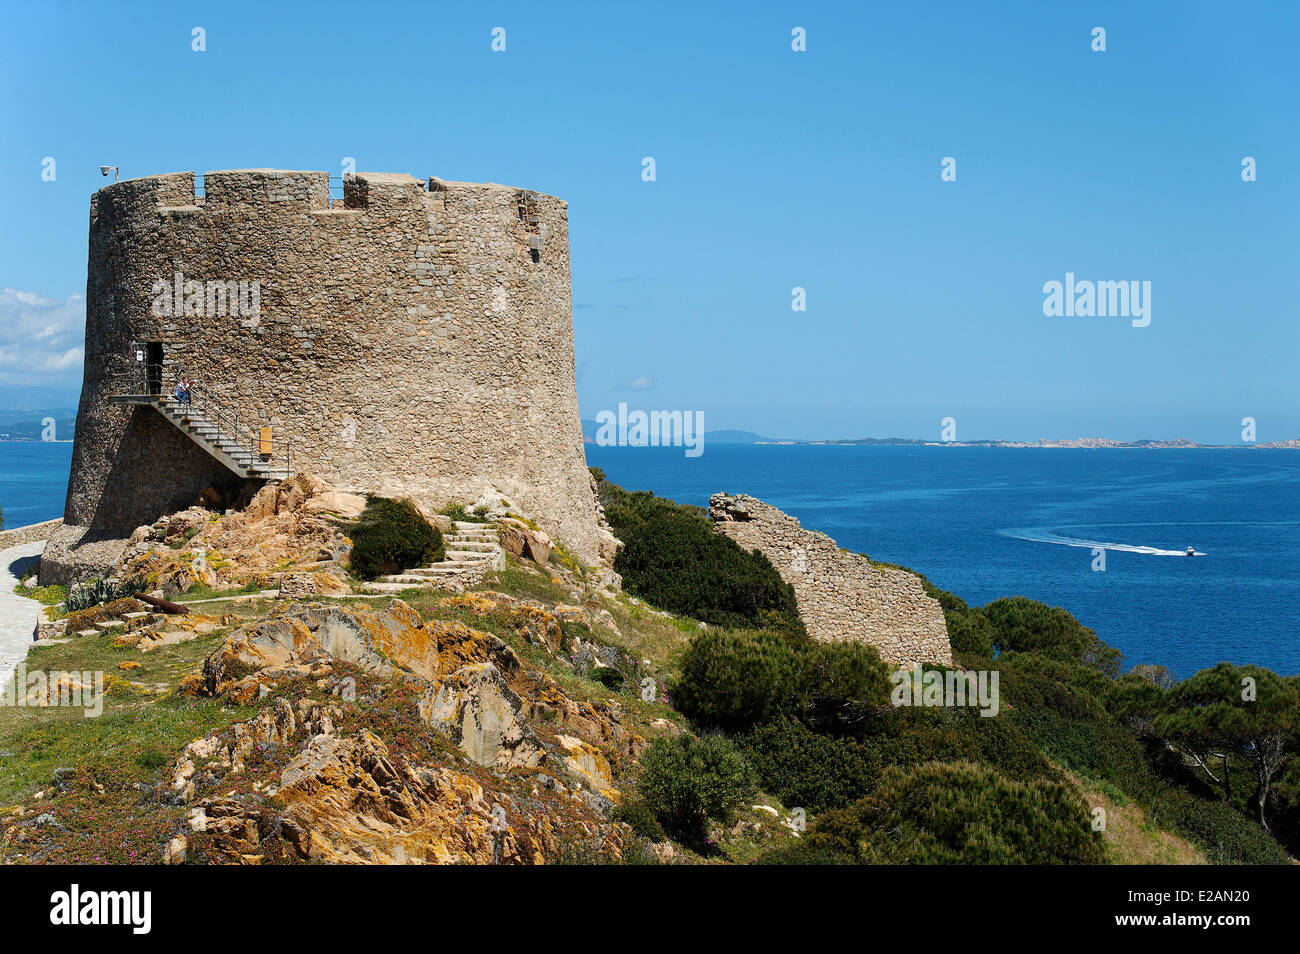 Italy, Sardinia, Olbia Tempio Province, Santa Teresa Gallura, defensive tower of the 16th century Longosardo built - Stock Image